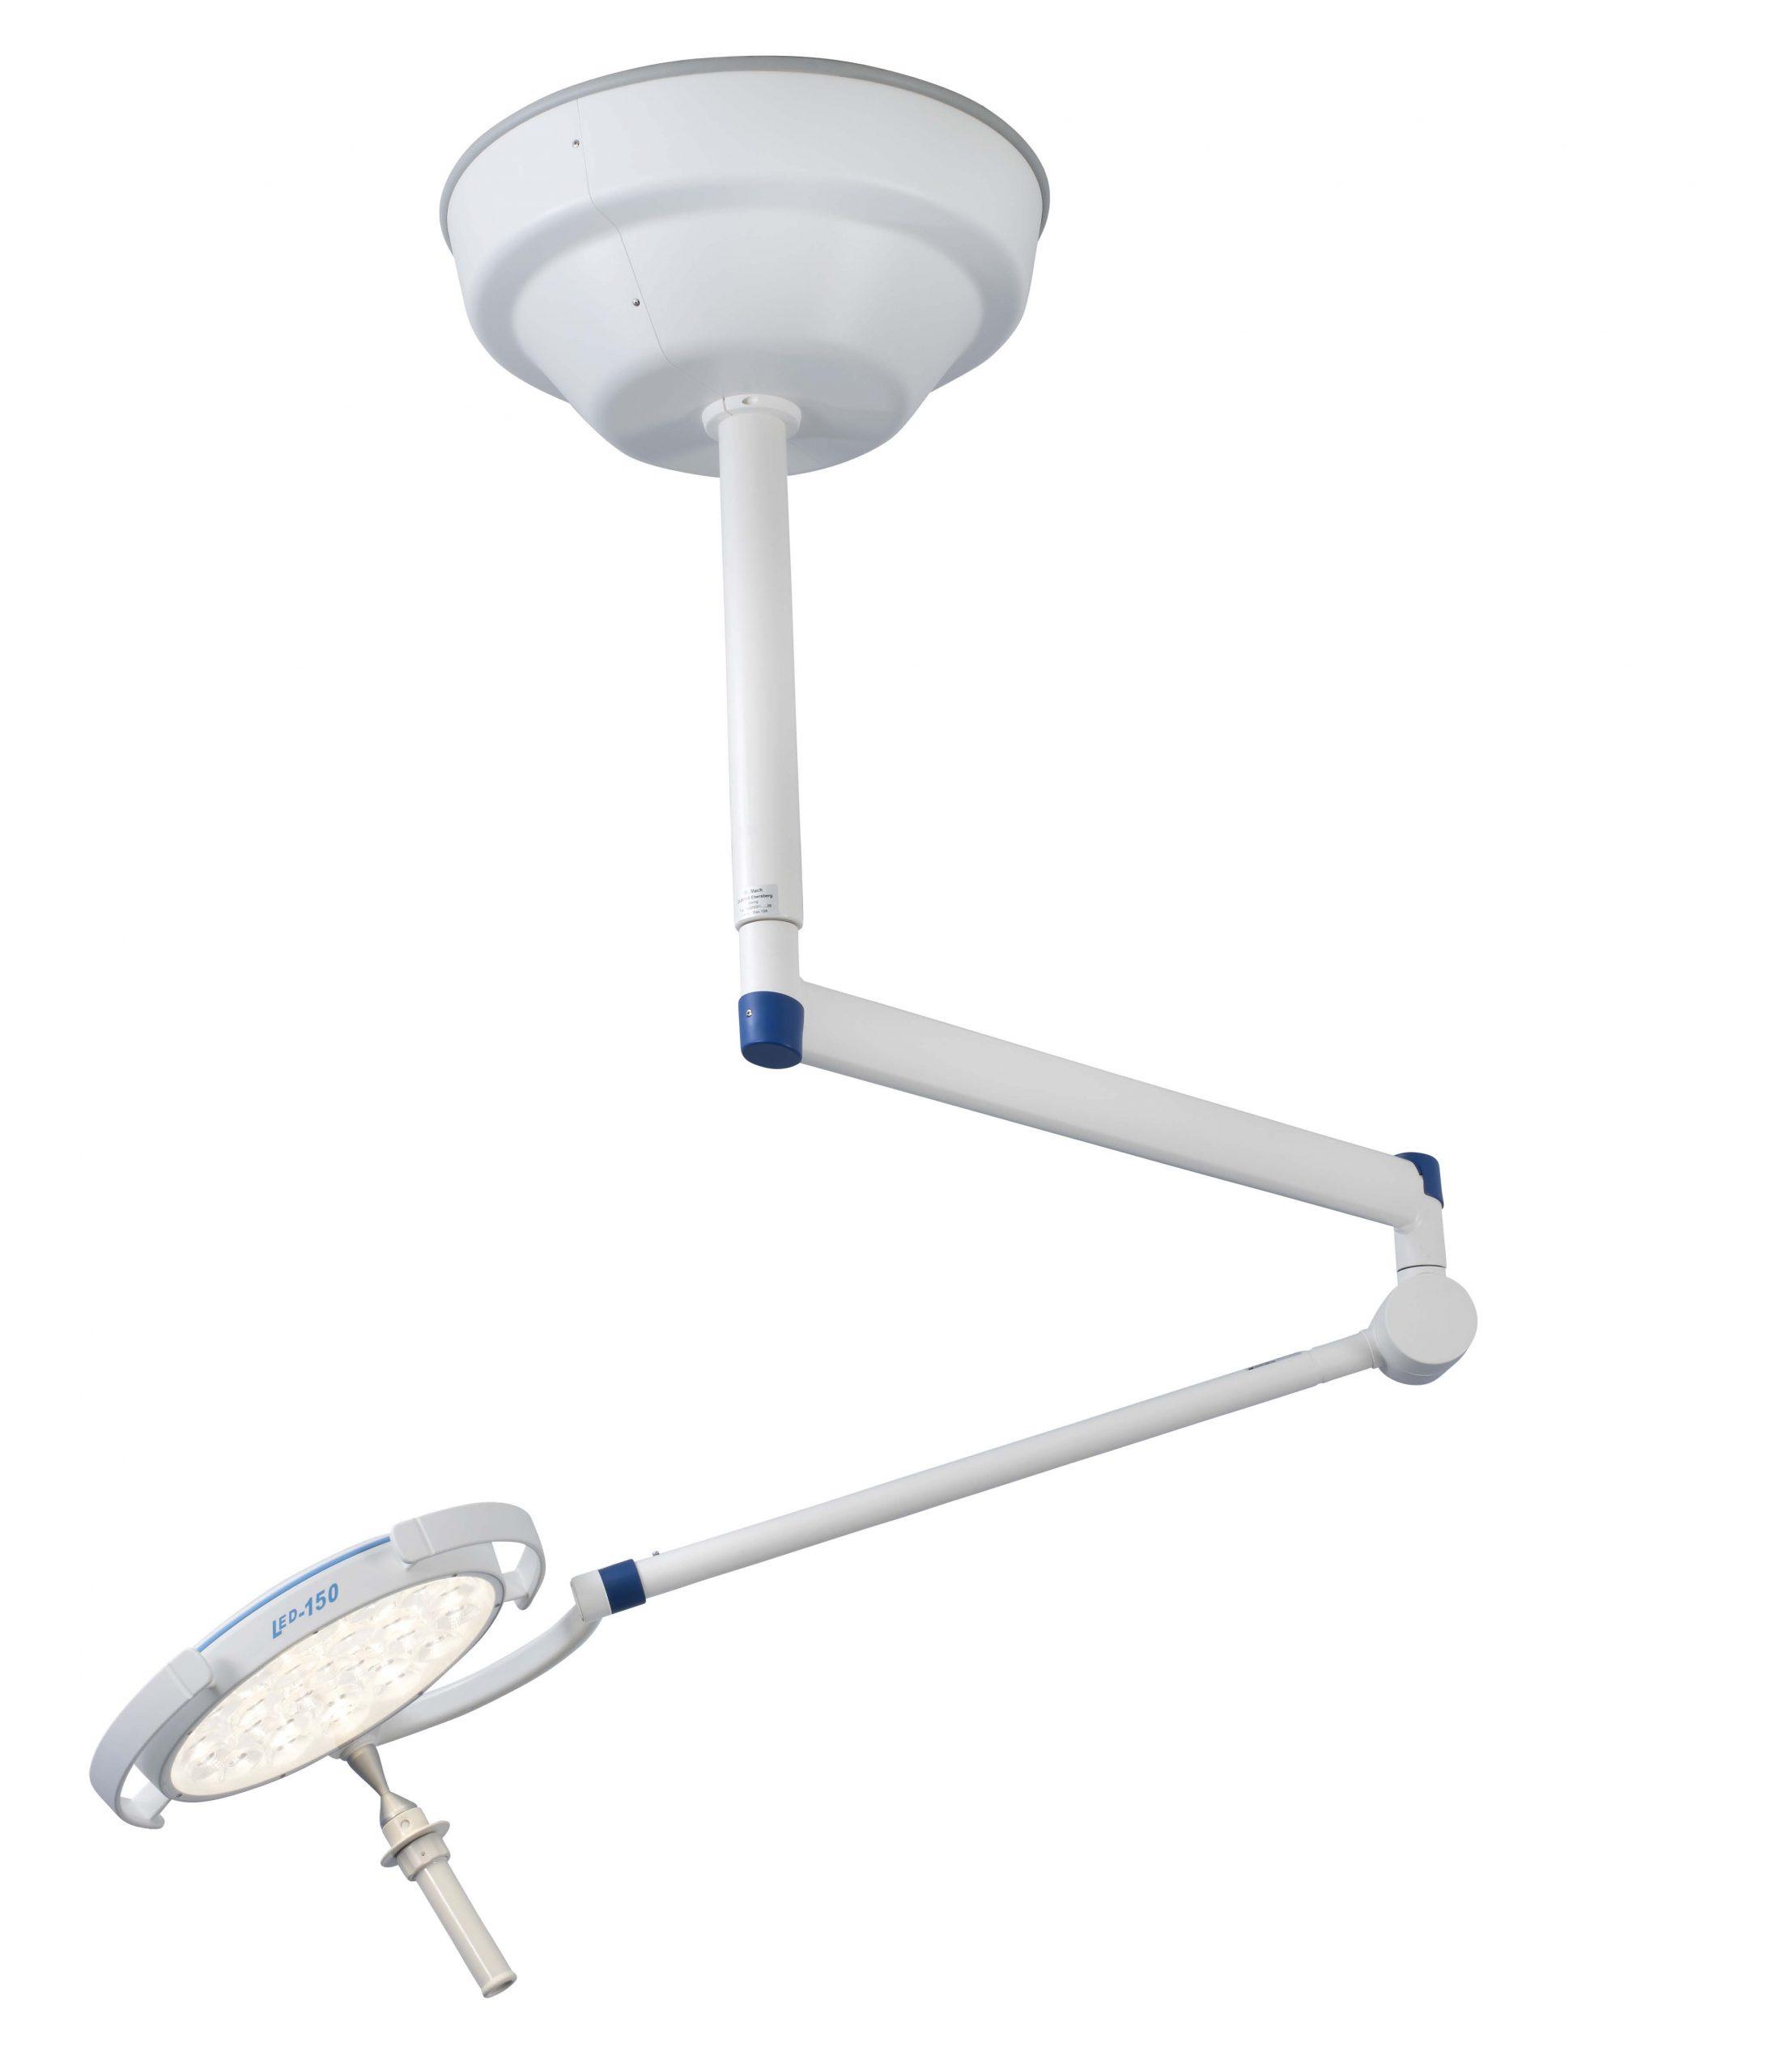 Onderzoekslamp-LED150-Swing-Plafondmodel